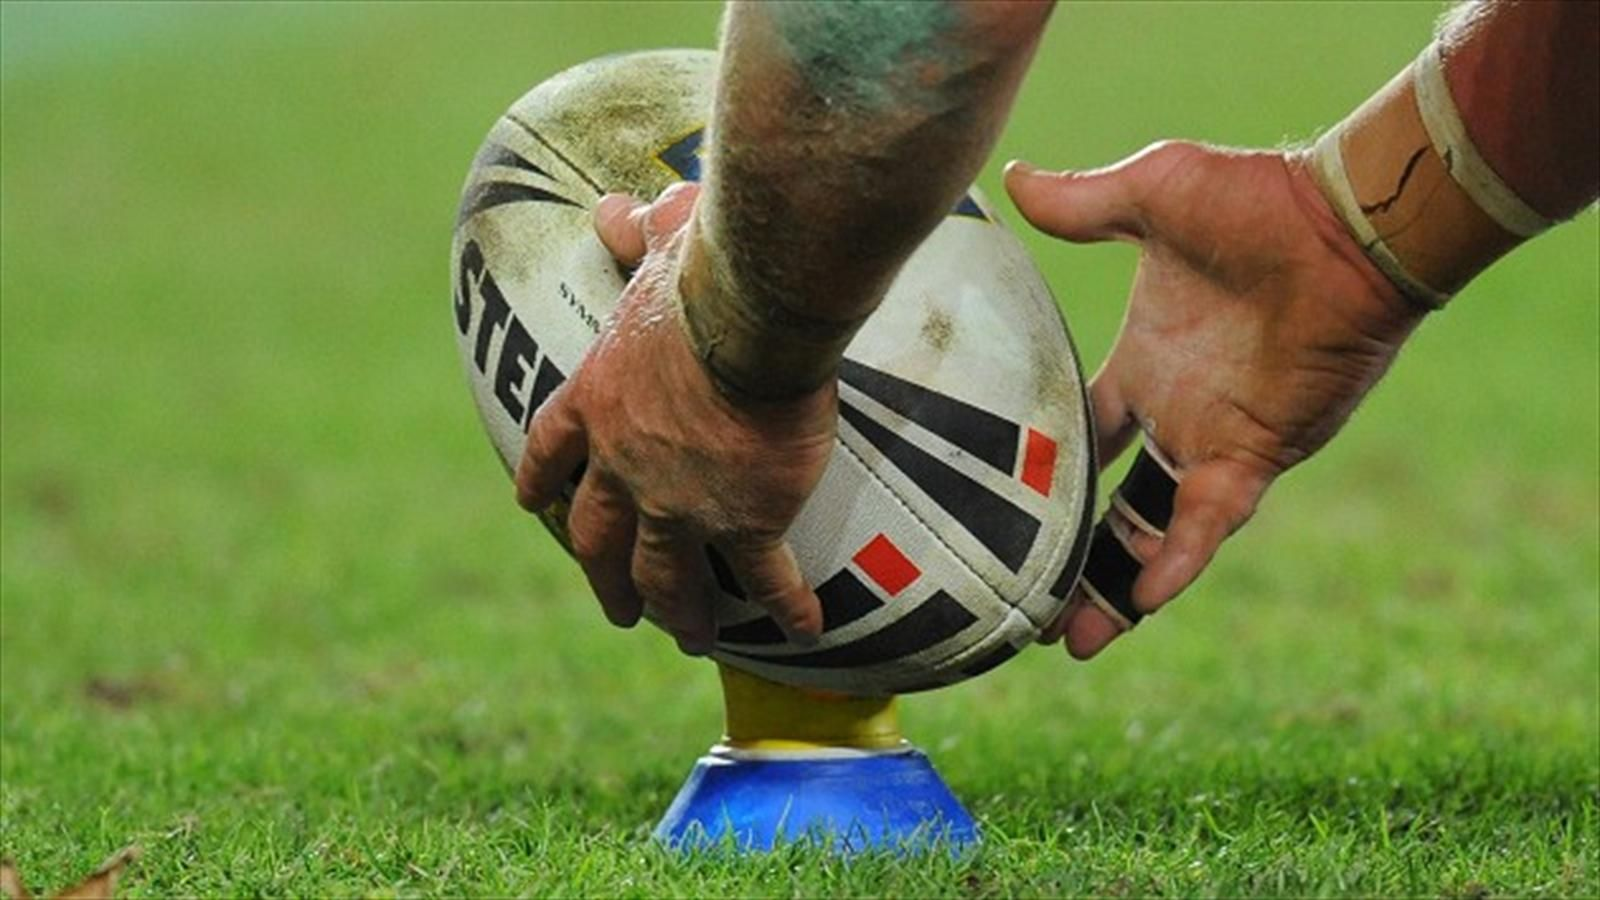 South Africa Rugby League launch Khoi representative team